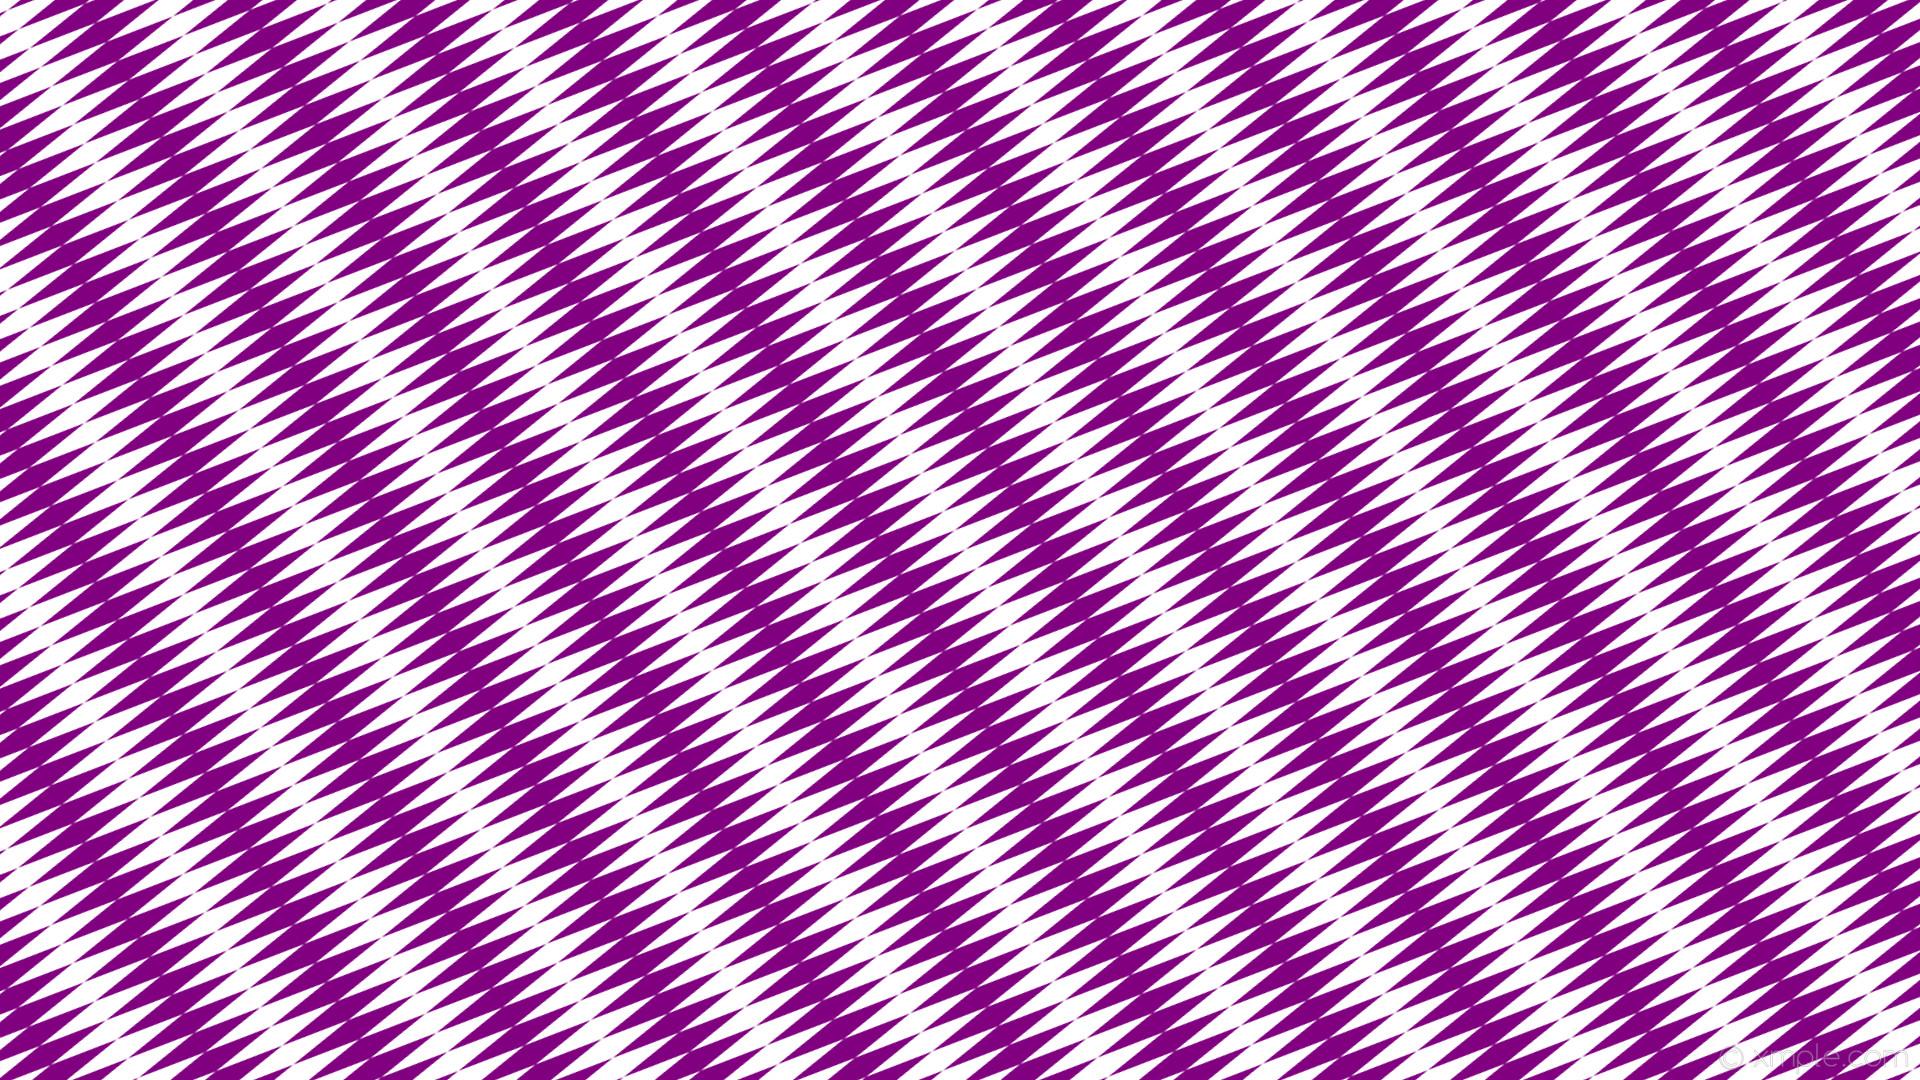 wallpaper rhombus purple diamond lozenge white #ffffff #800080 30° 140px  22px